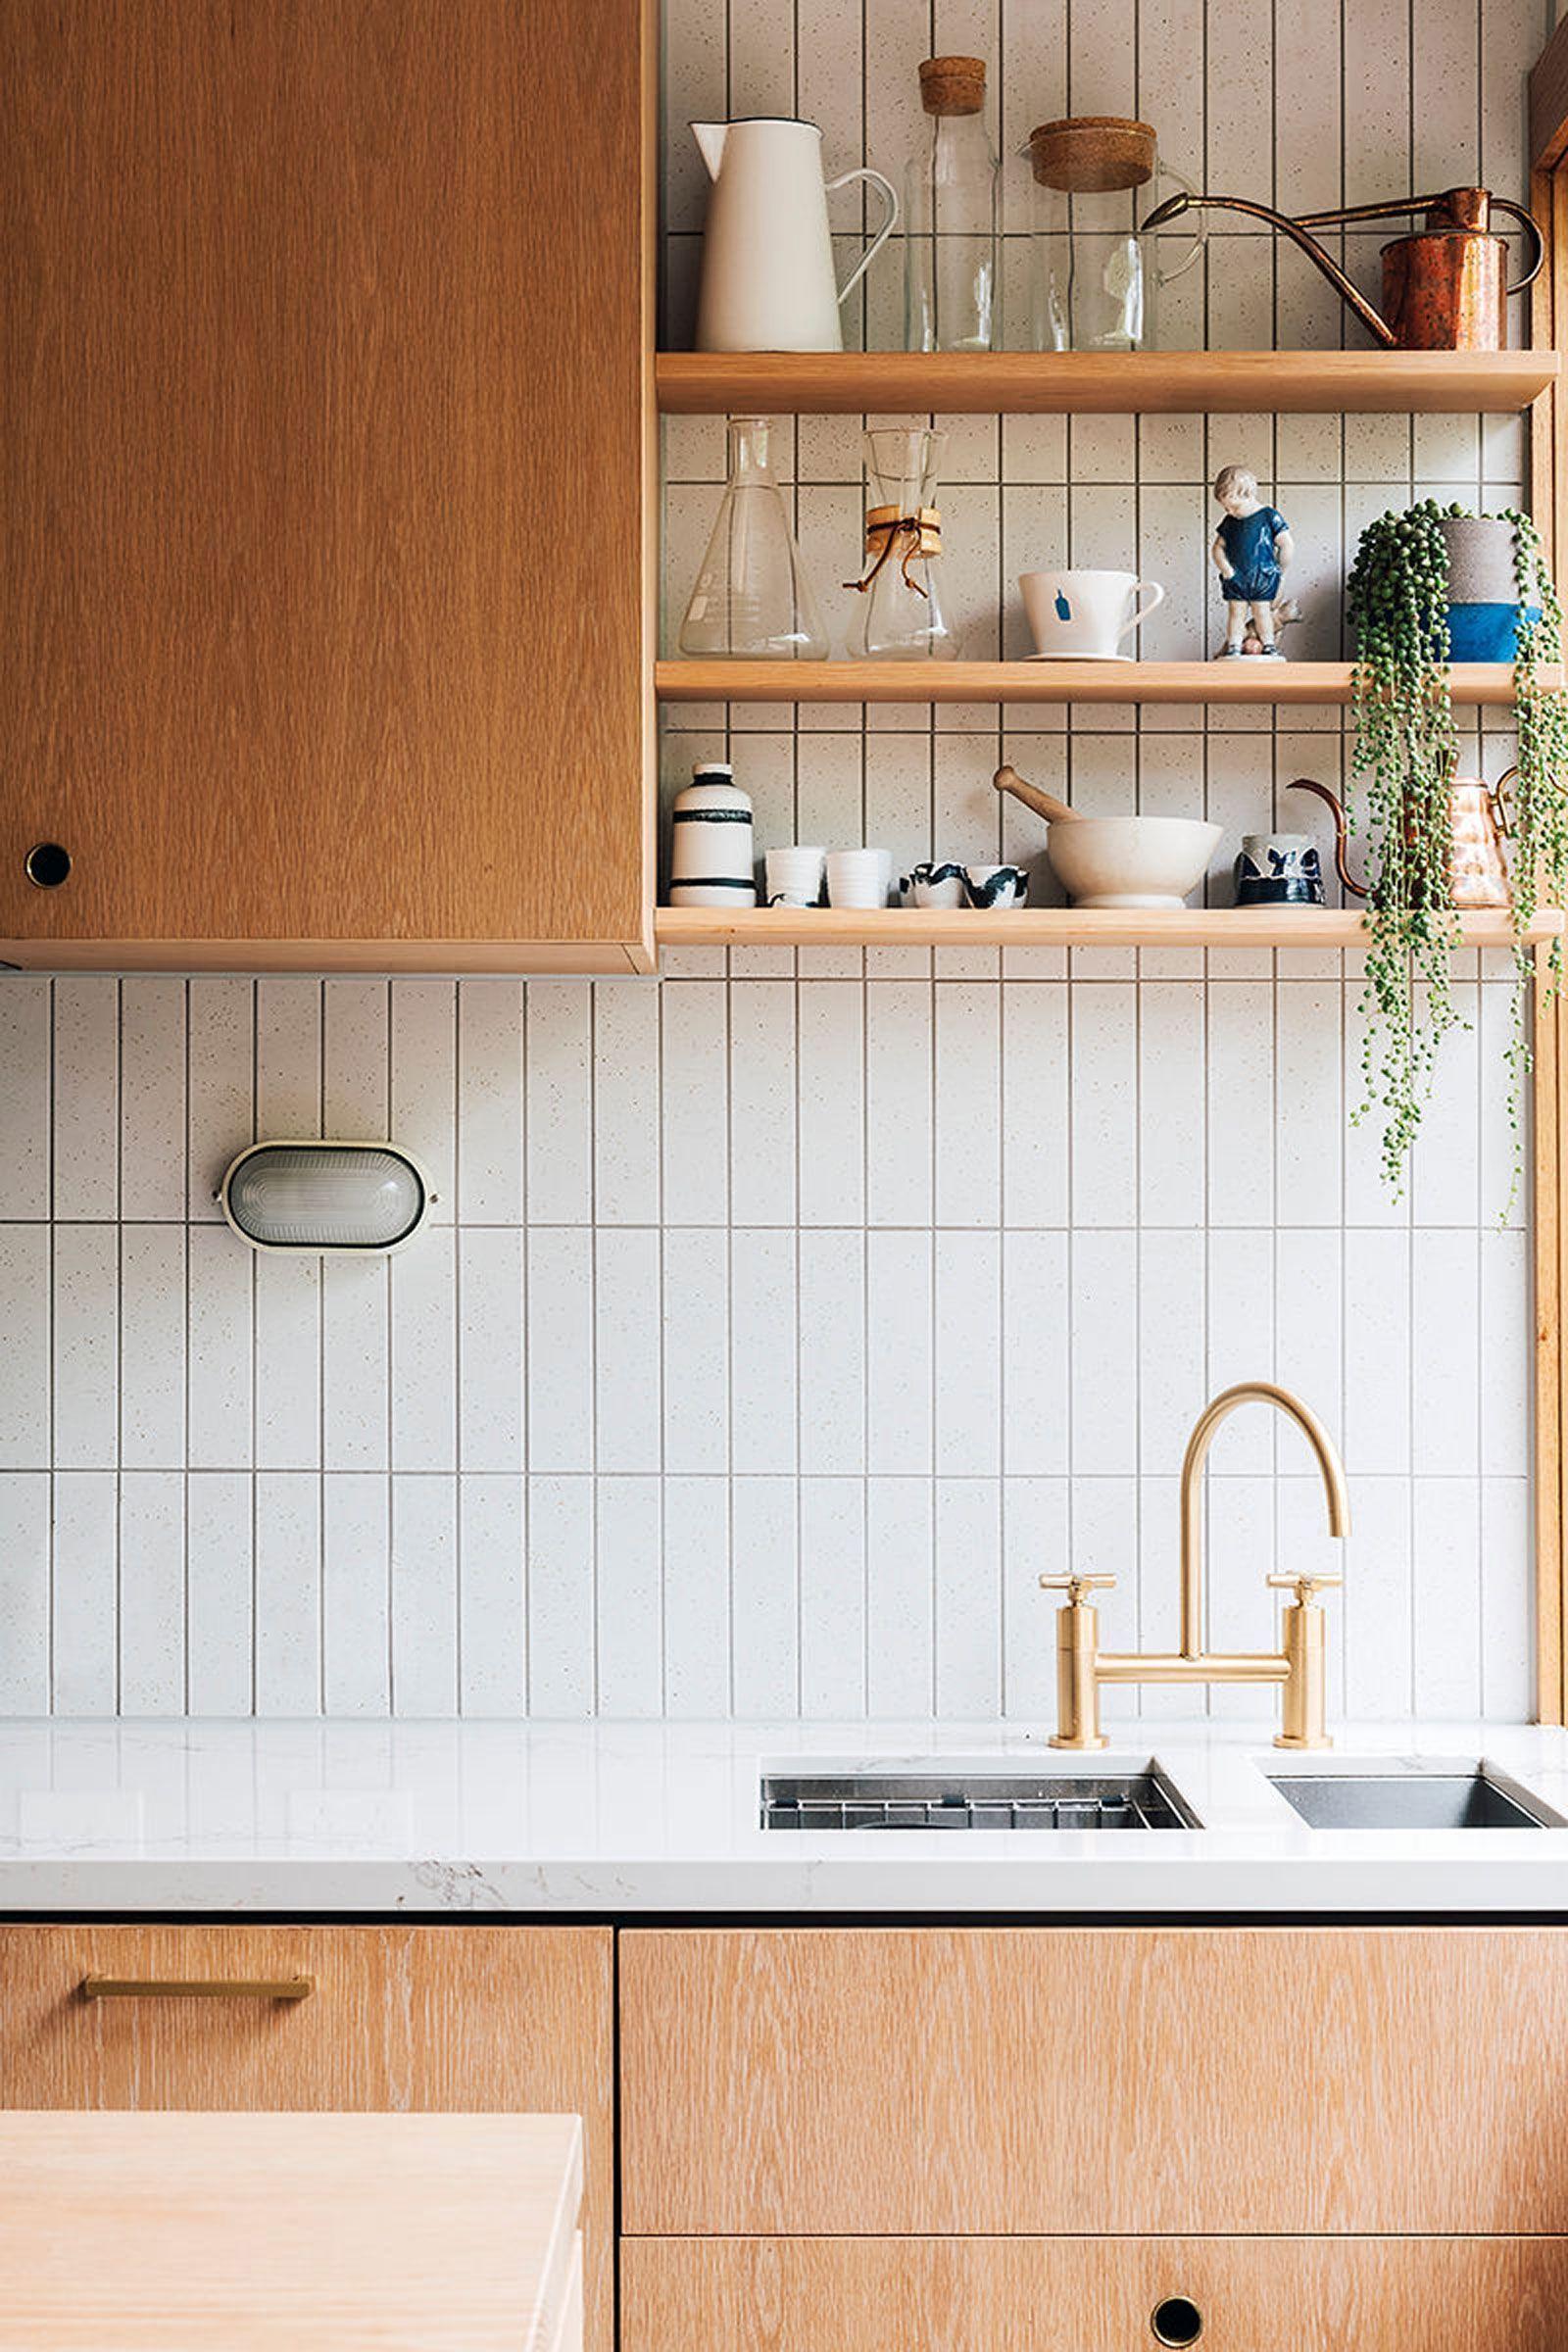 Home Decoration Ideas Modern Minimalist Home Interior.Home Decoration Ideas Modern  Minimalist Home Interior